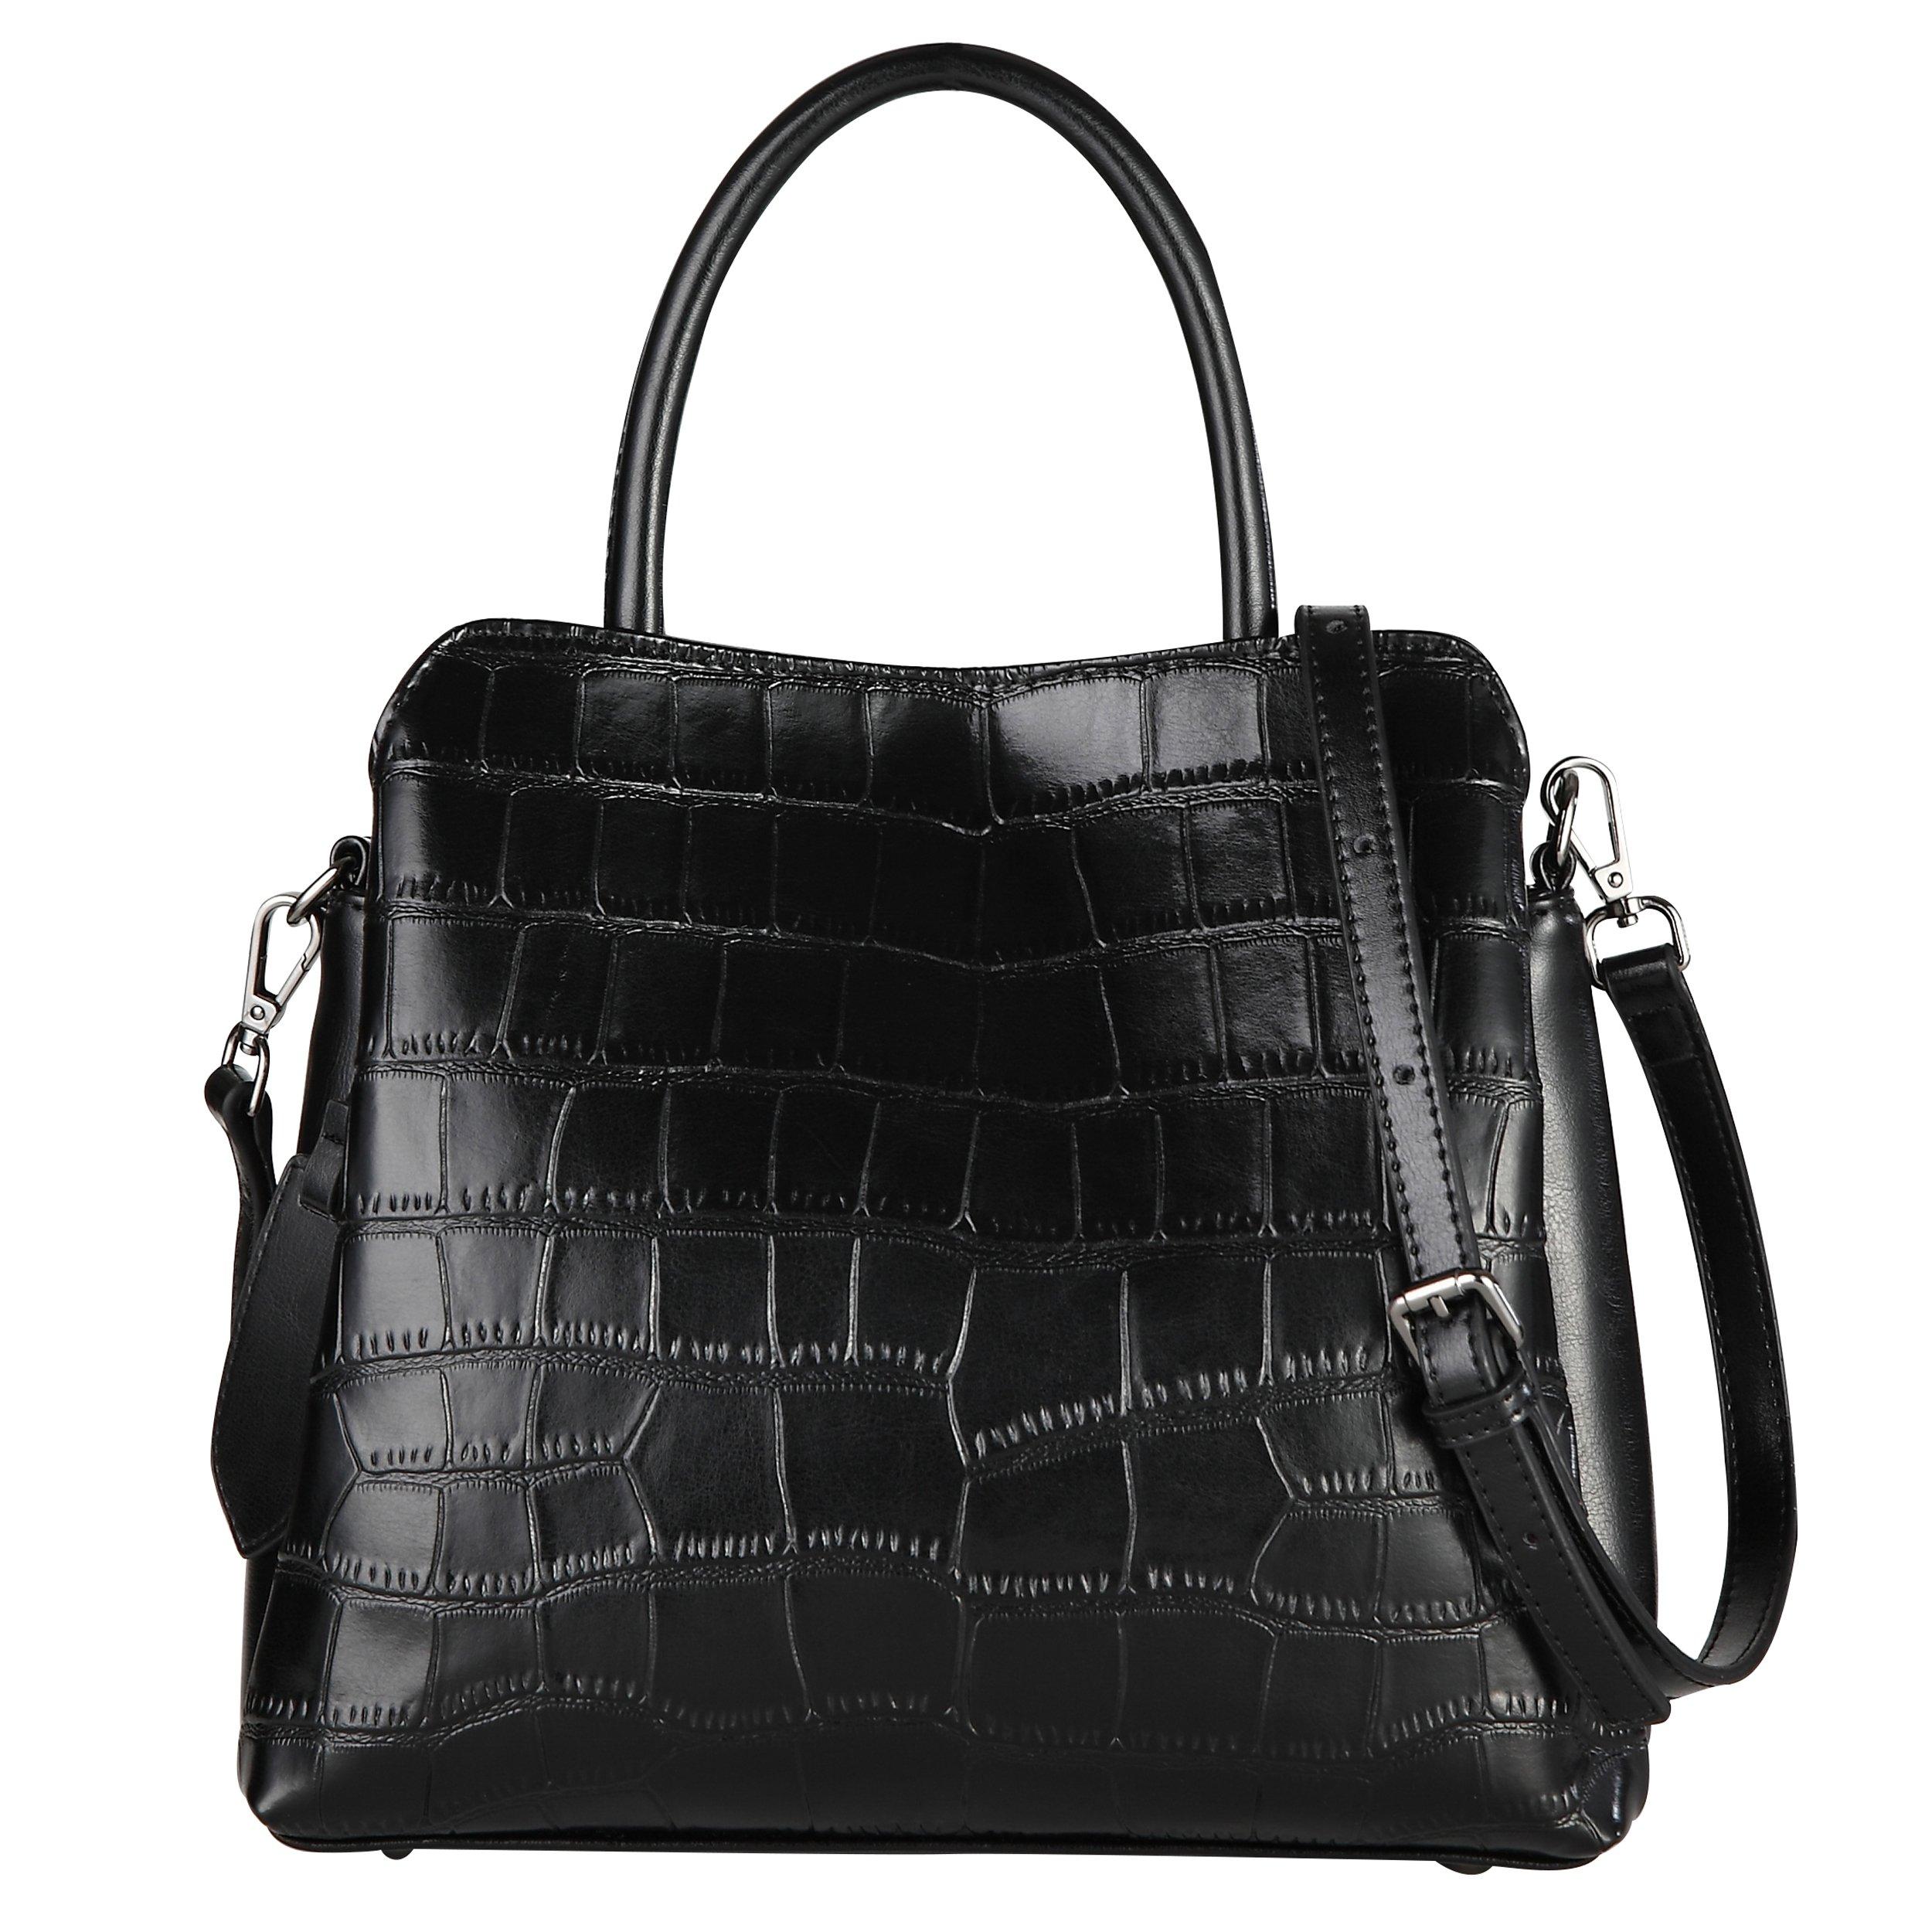 Yiwanda Women's Genuine Leather Handbags Satchel Fashion Tote Bag Purse Shoulder Bags (Black)